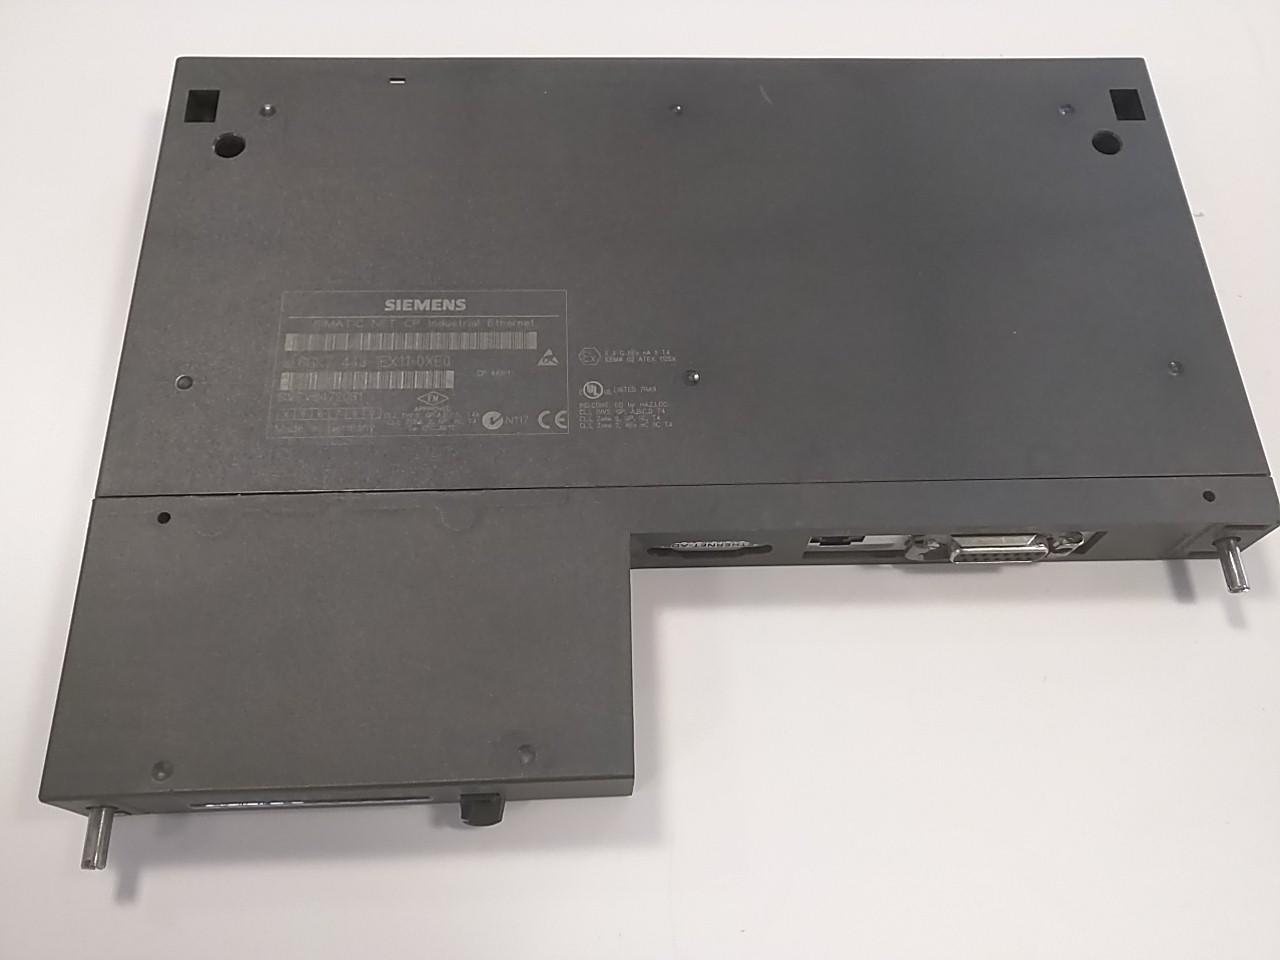 Siemens cpu 414 4 h 1